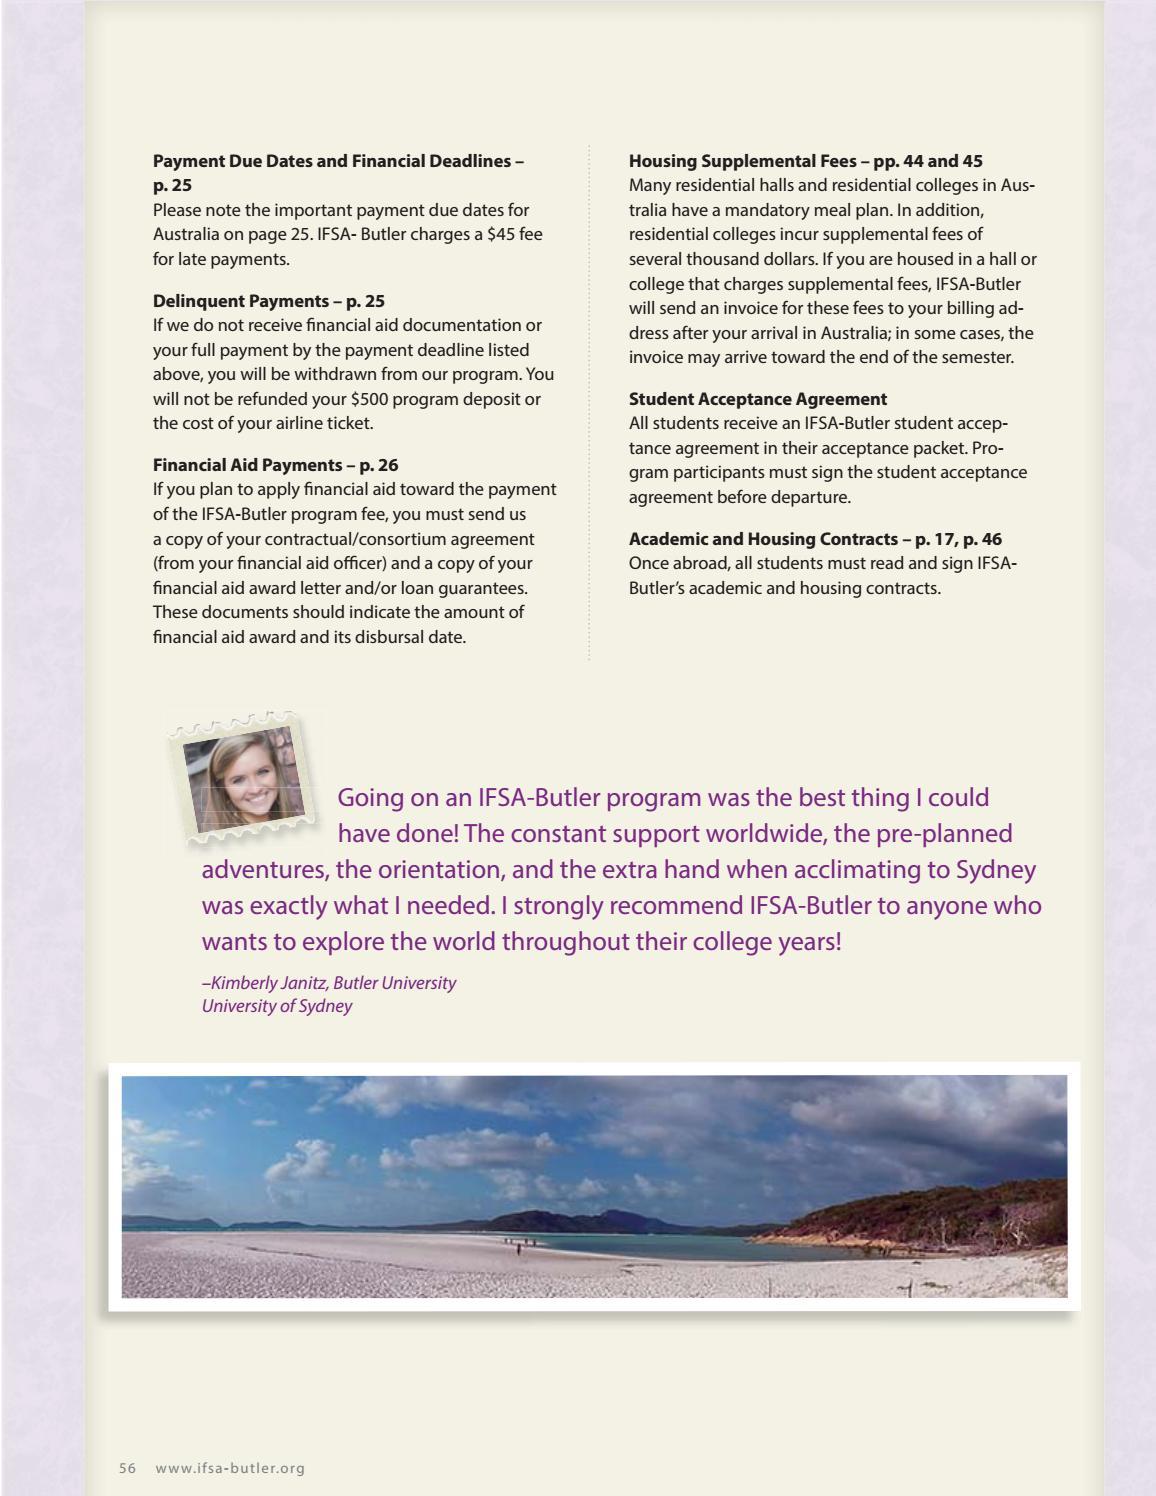 Preparing to study abroad australia by ifsa butler issuu platinumwayz